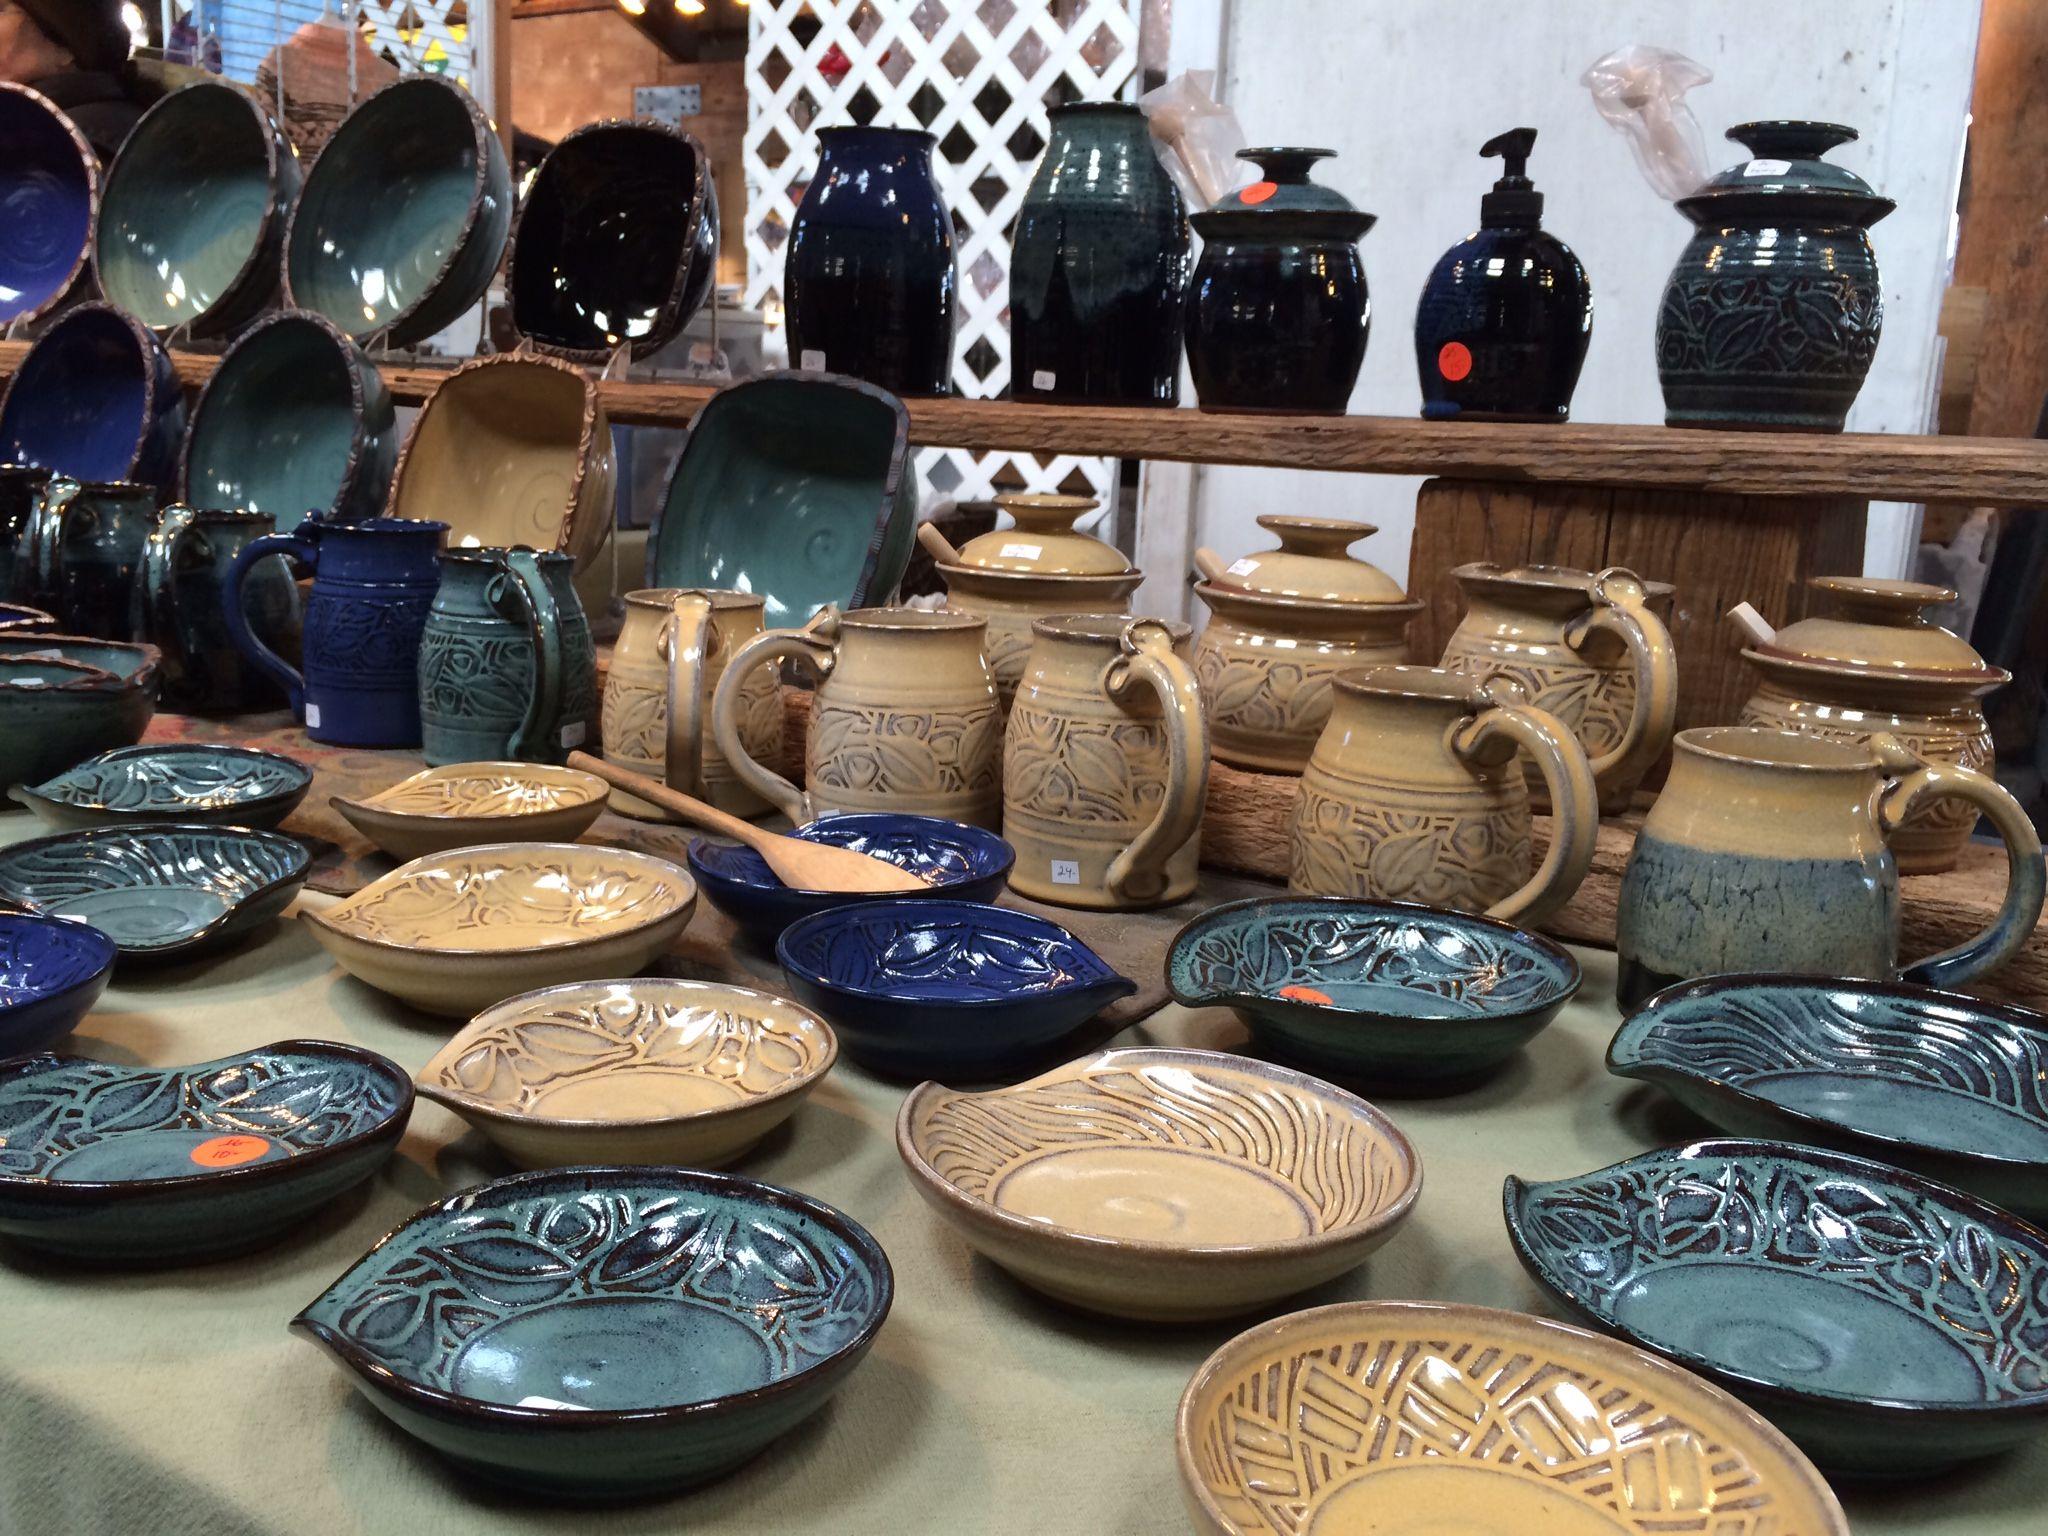 Handmade ceramics from Sunrise Beach Pottery. The kind of